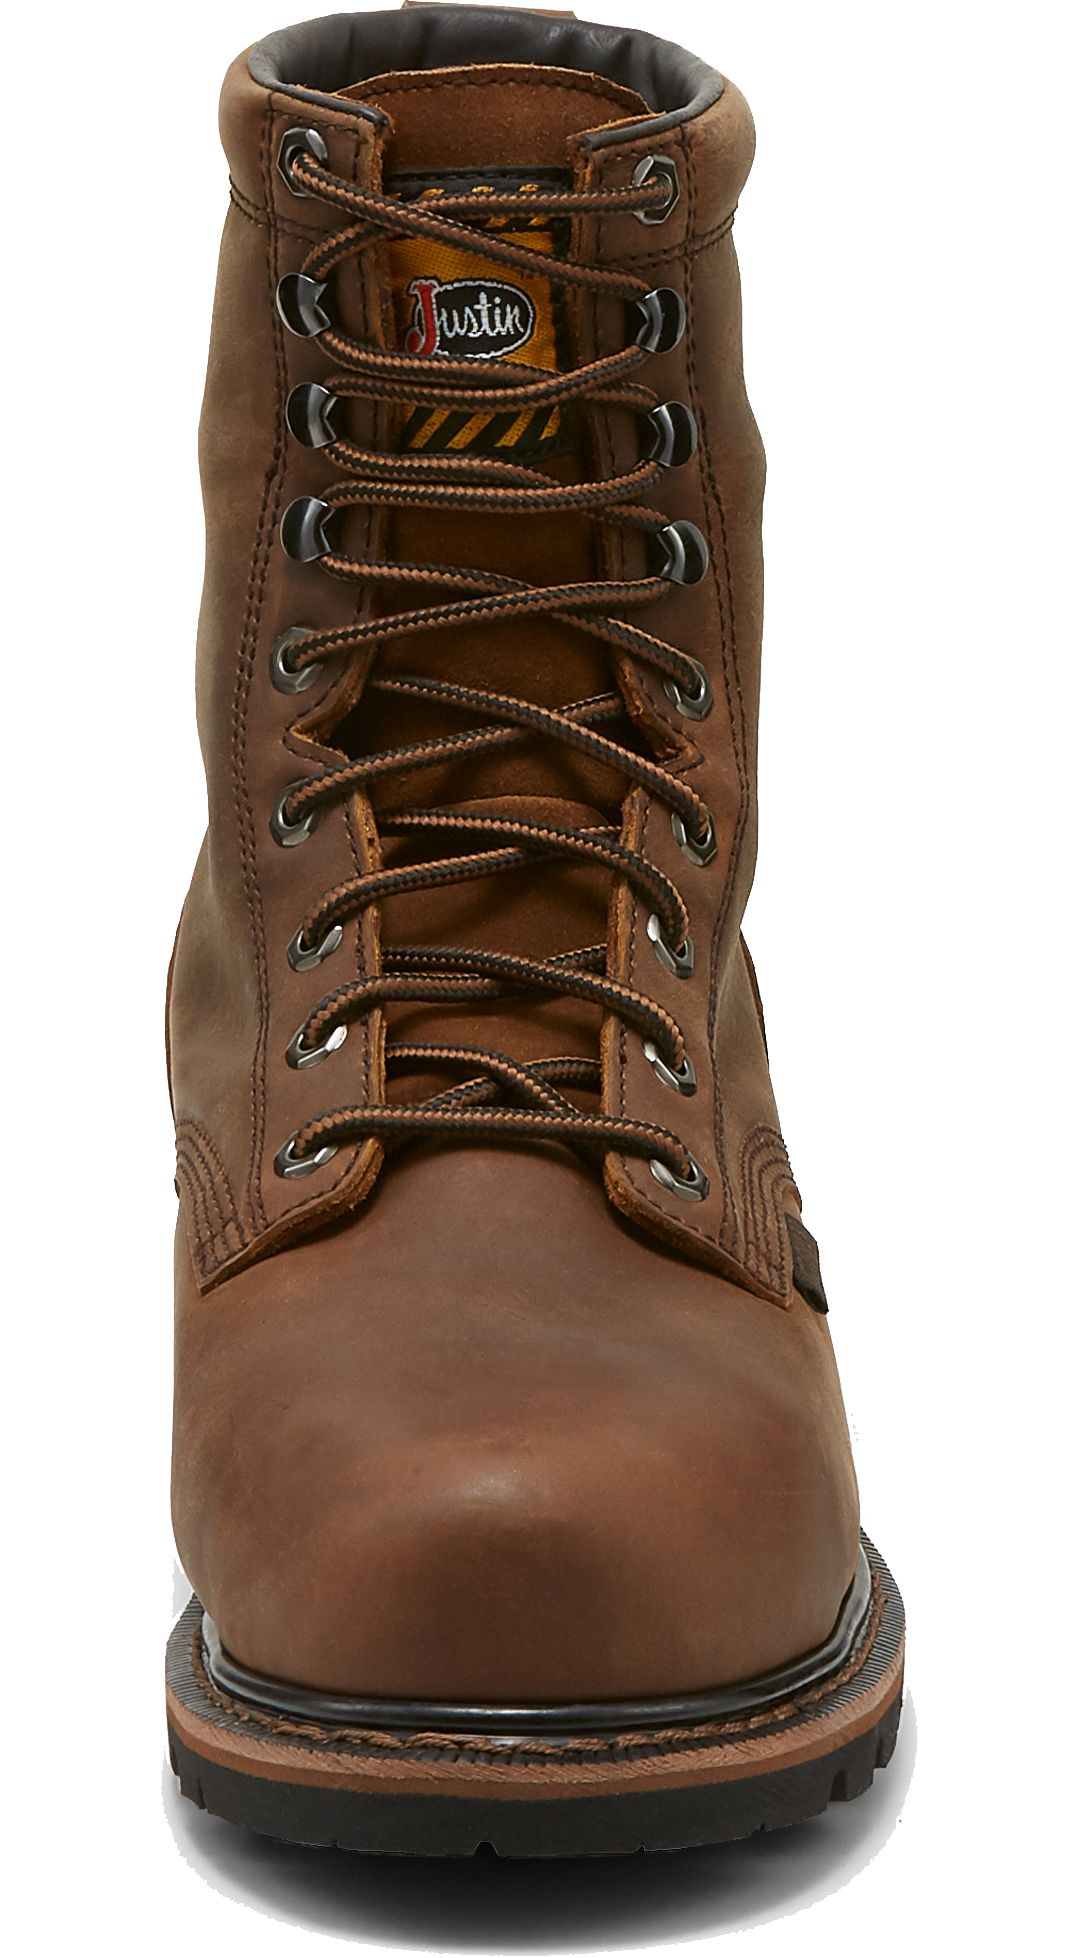 efe6e22ce9c Justin Men's Pulley MetGuard Composite Toe EH Work Boots